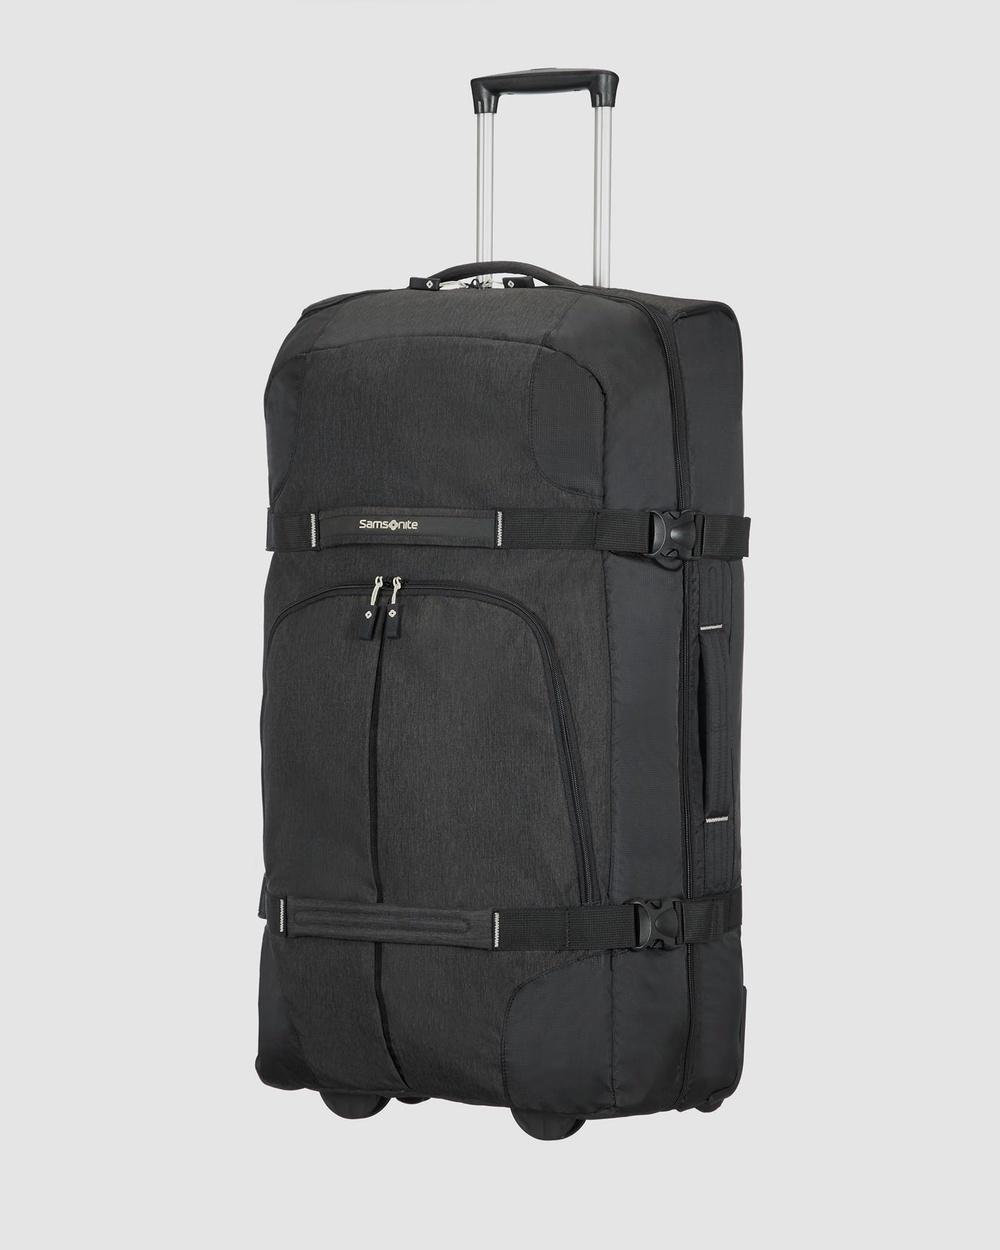 Samsonite Rewind Duffle Wheeled 82cm Bags Black